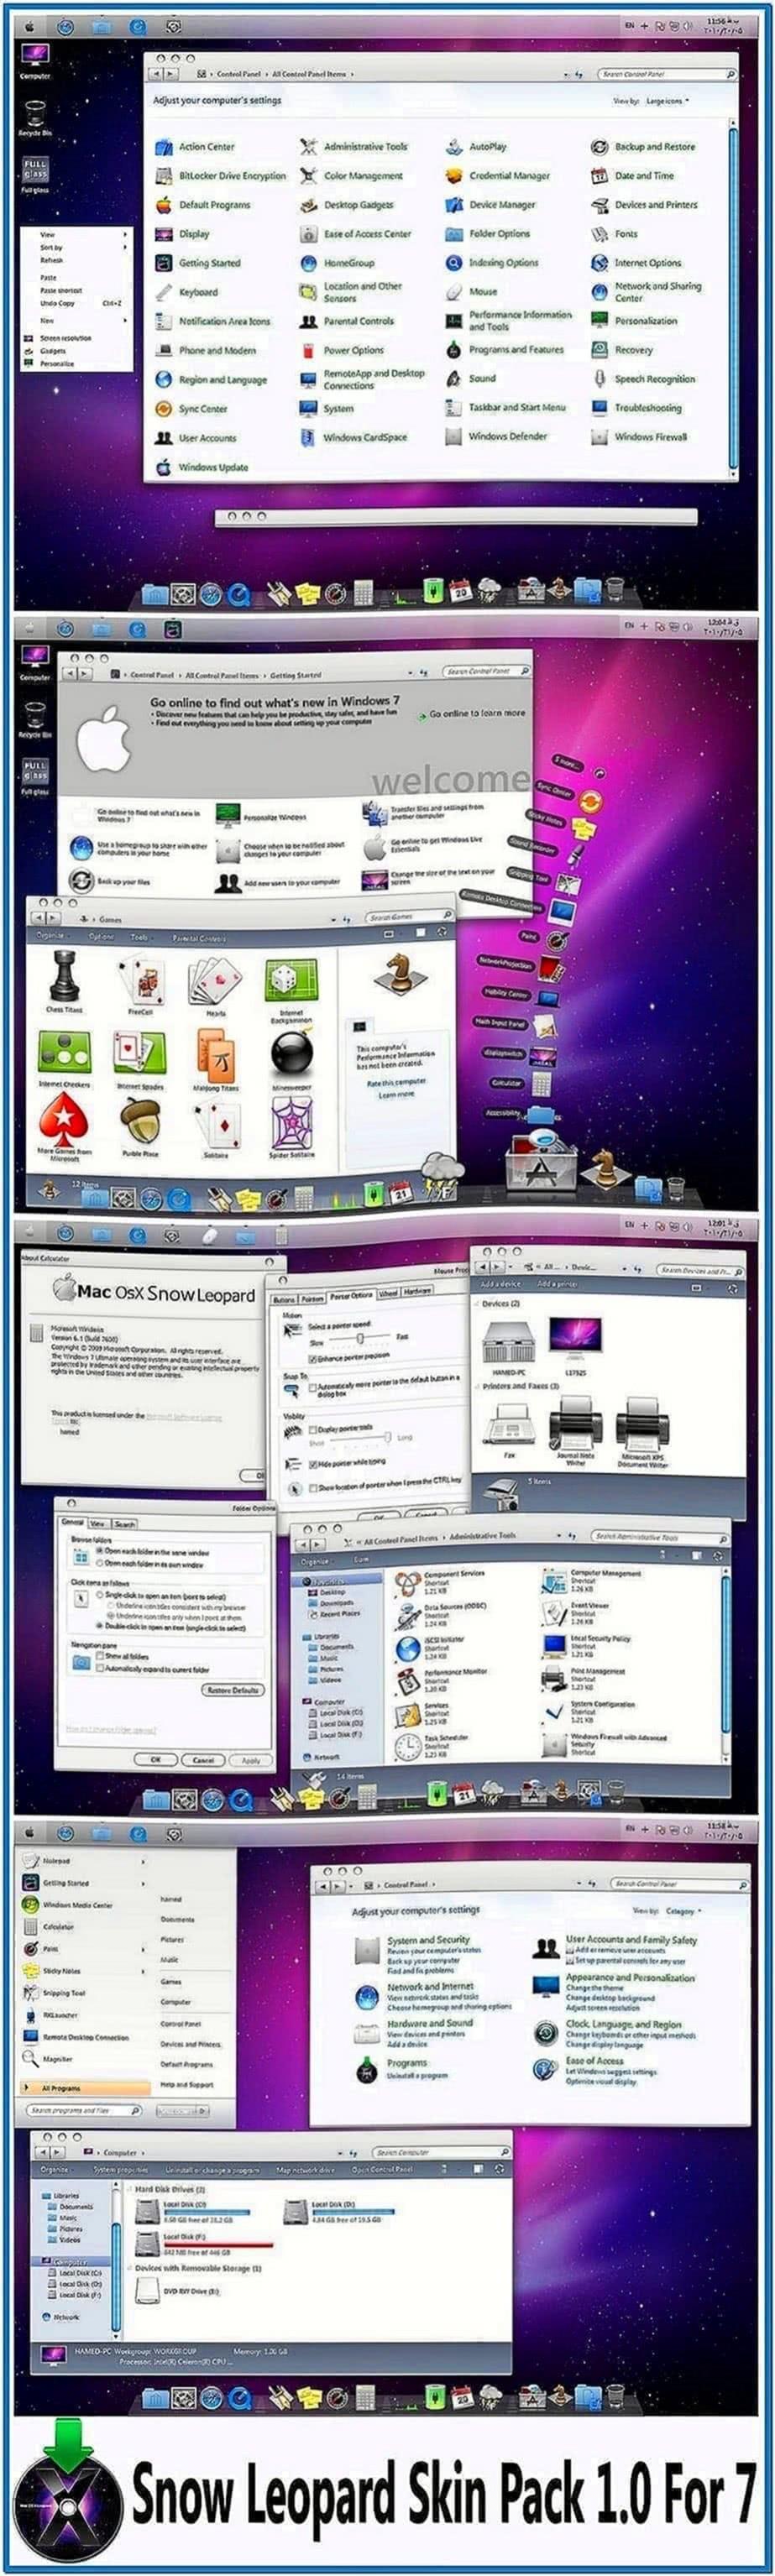 Screensaver pack x86 64bit